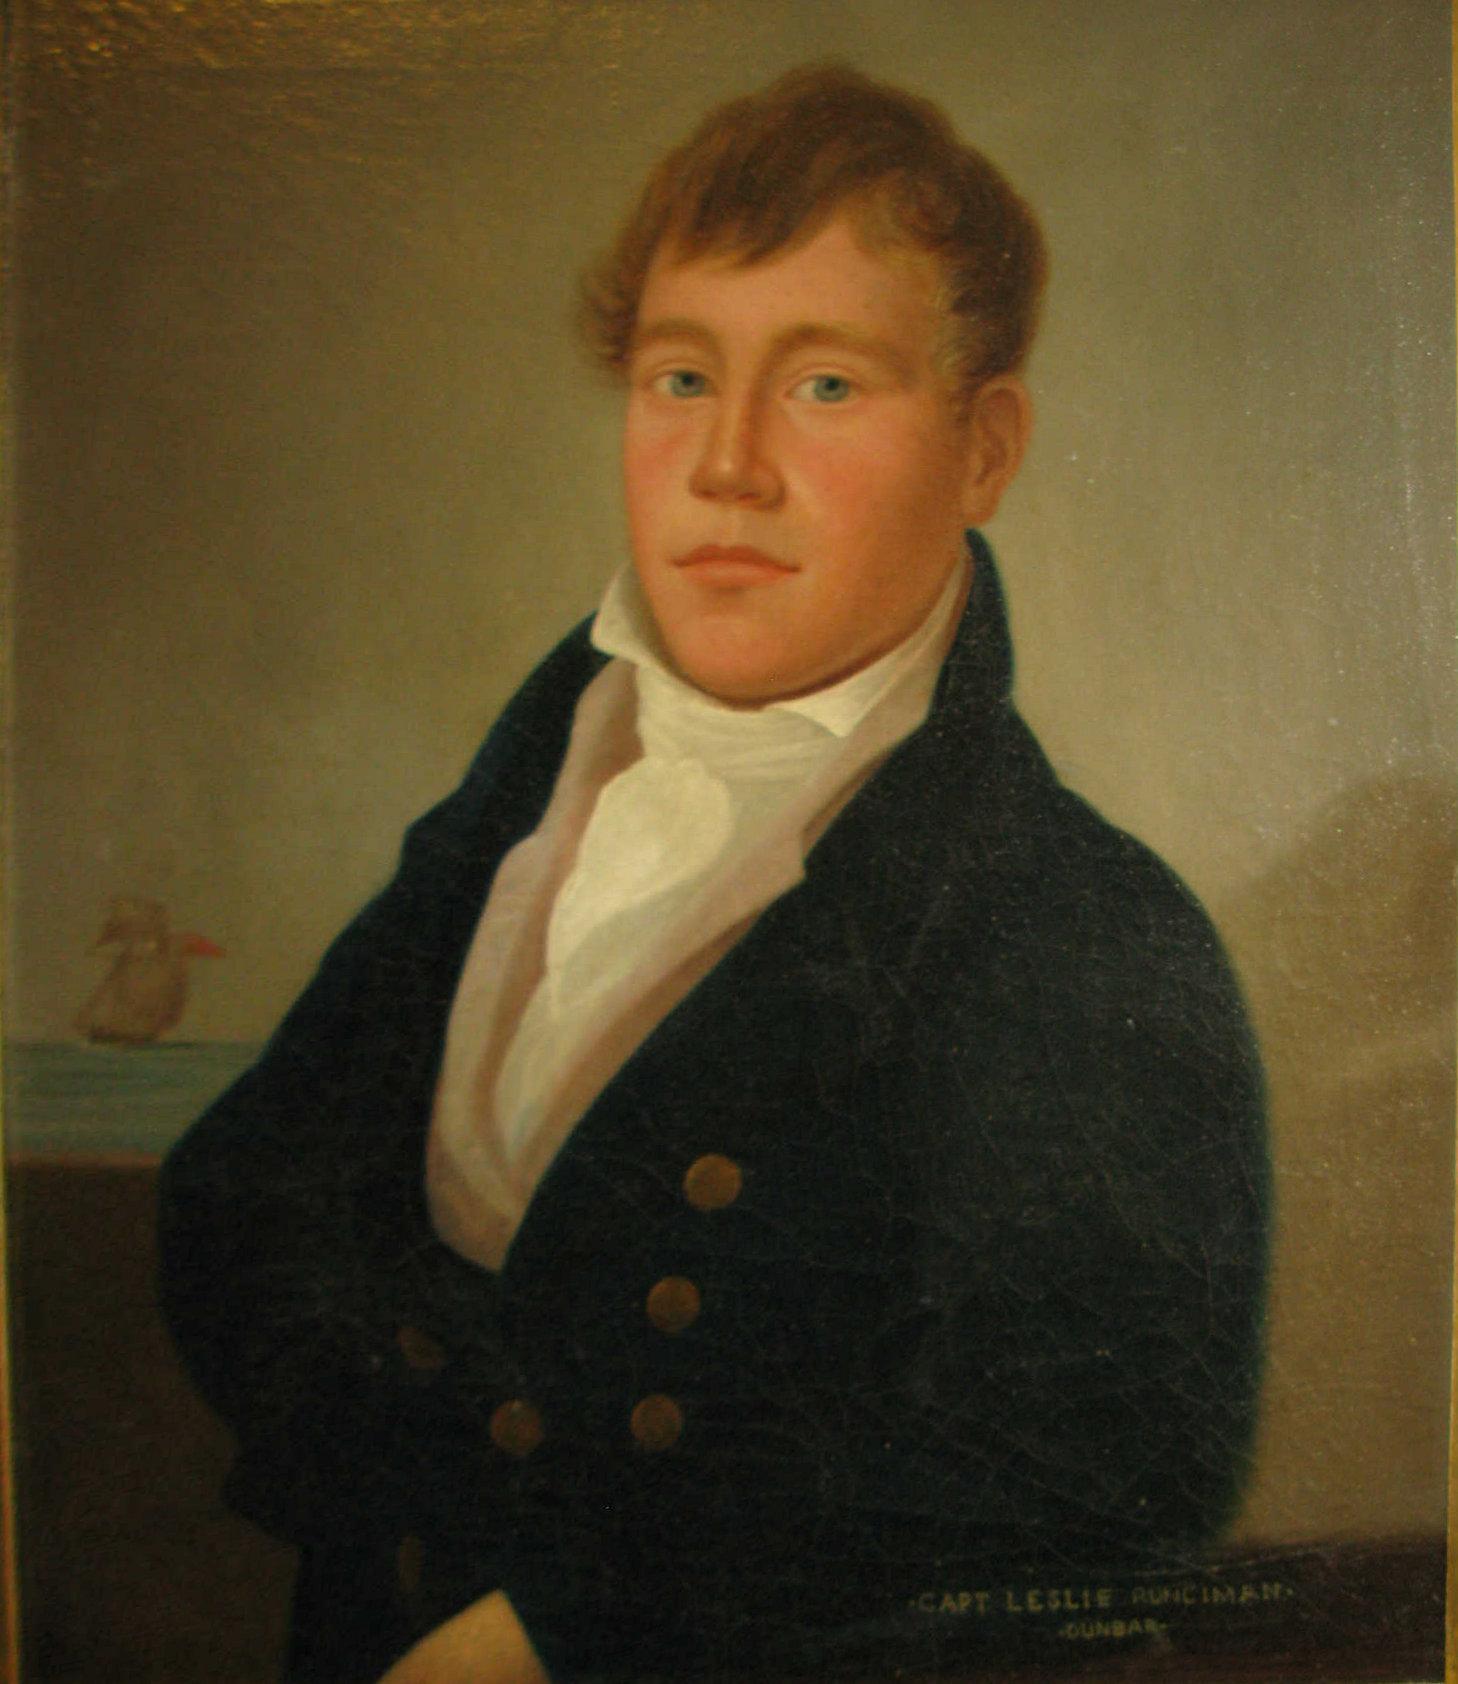 19TH CENTURY SCOTTISH SCHOOL HALF LENGTH PORTRAIT OF CAPTAIN LESLIE RUNCIMAN